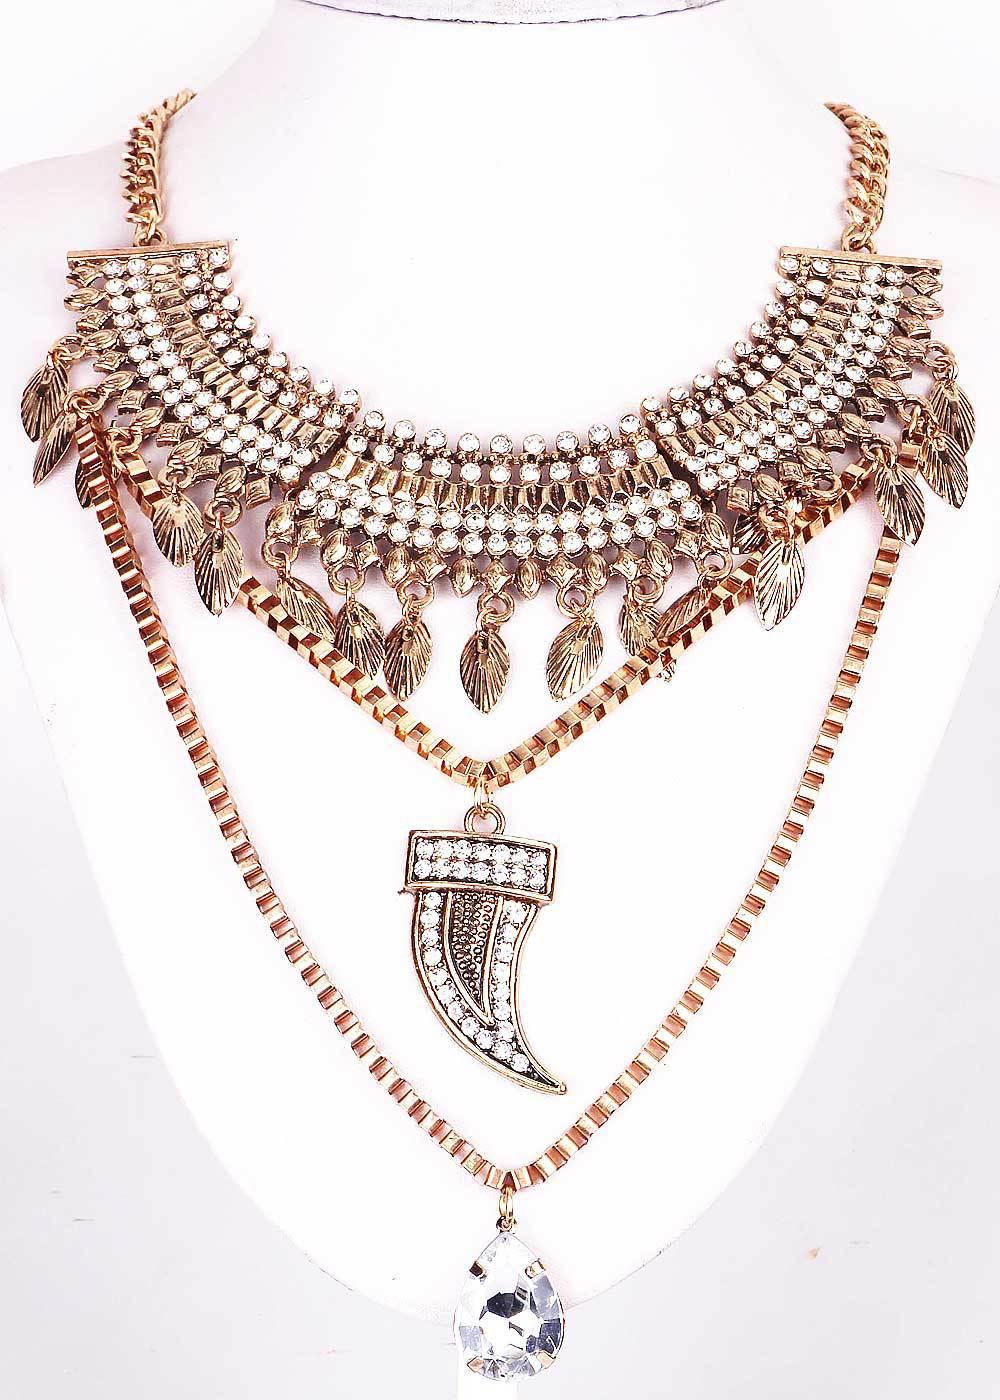 New Handmade Fashion Woman ethnic Antique Gold/silver Dagger Style Pendant Crystal Bib Statement Chunky Choker Necklaces(China (Mainland))